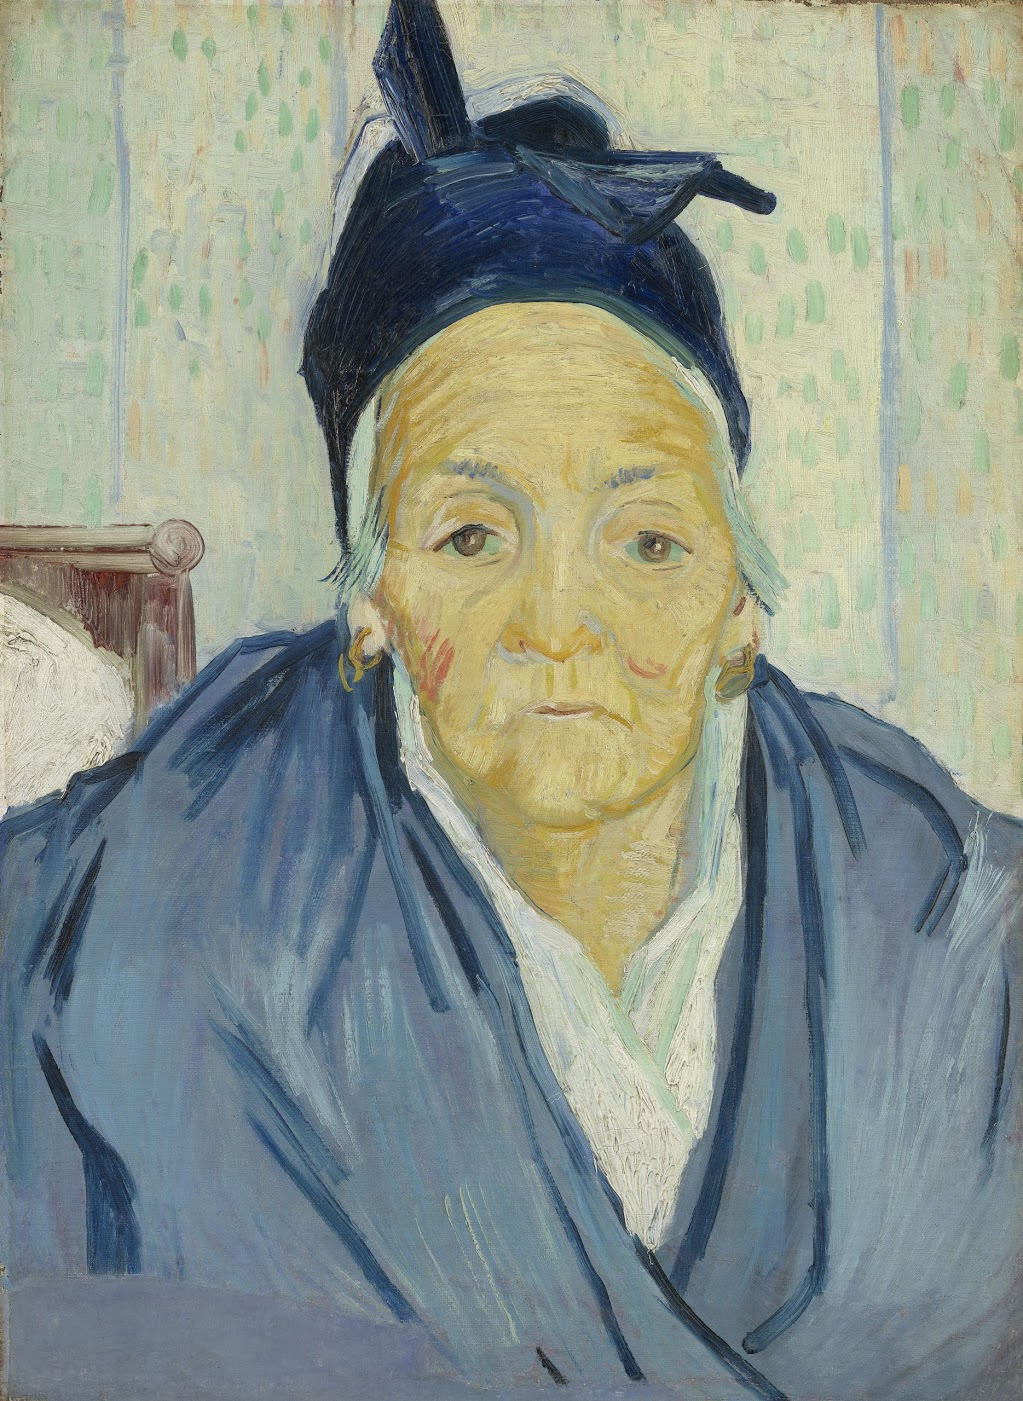 An Old Woman of Arles.Arles, February 1888 Vincent van Gogh (1853 - 1890).Van Gogh Museum, Amsterdam.